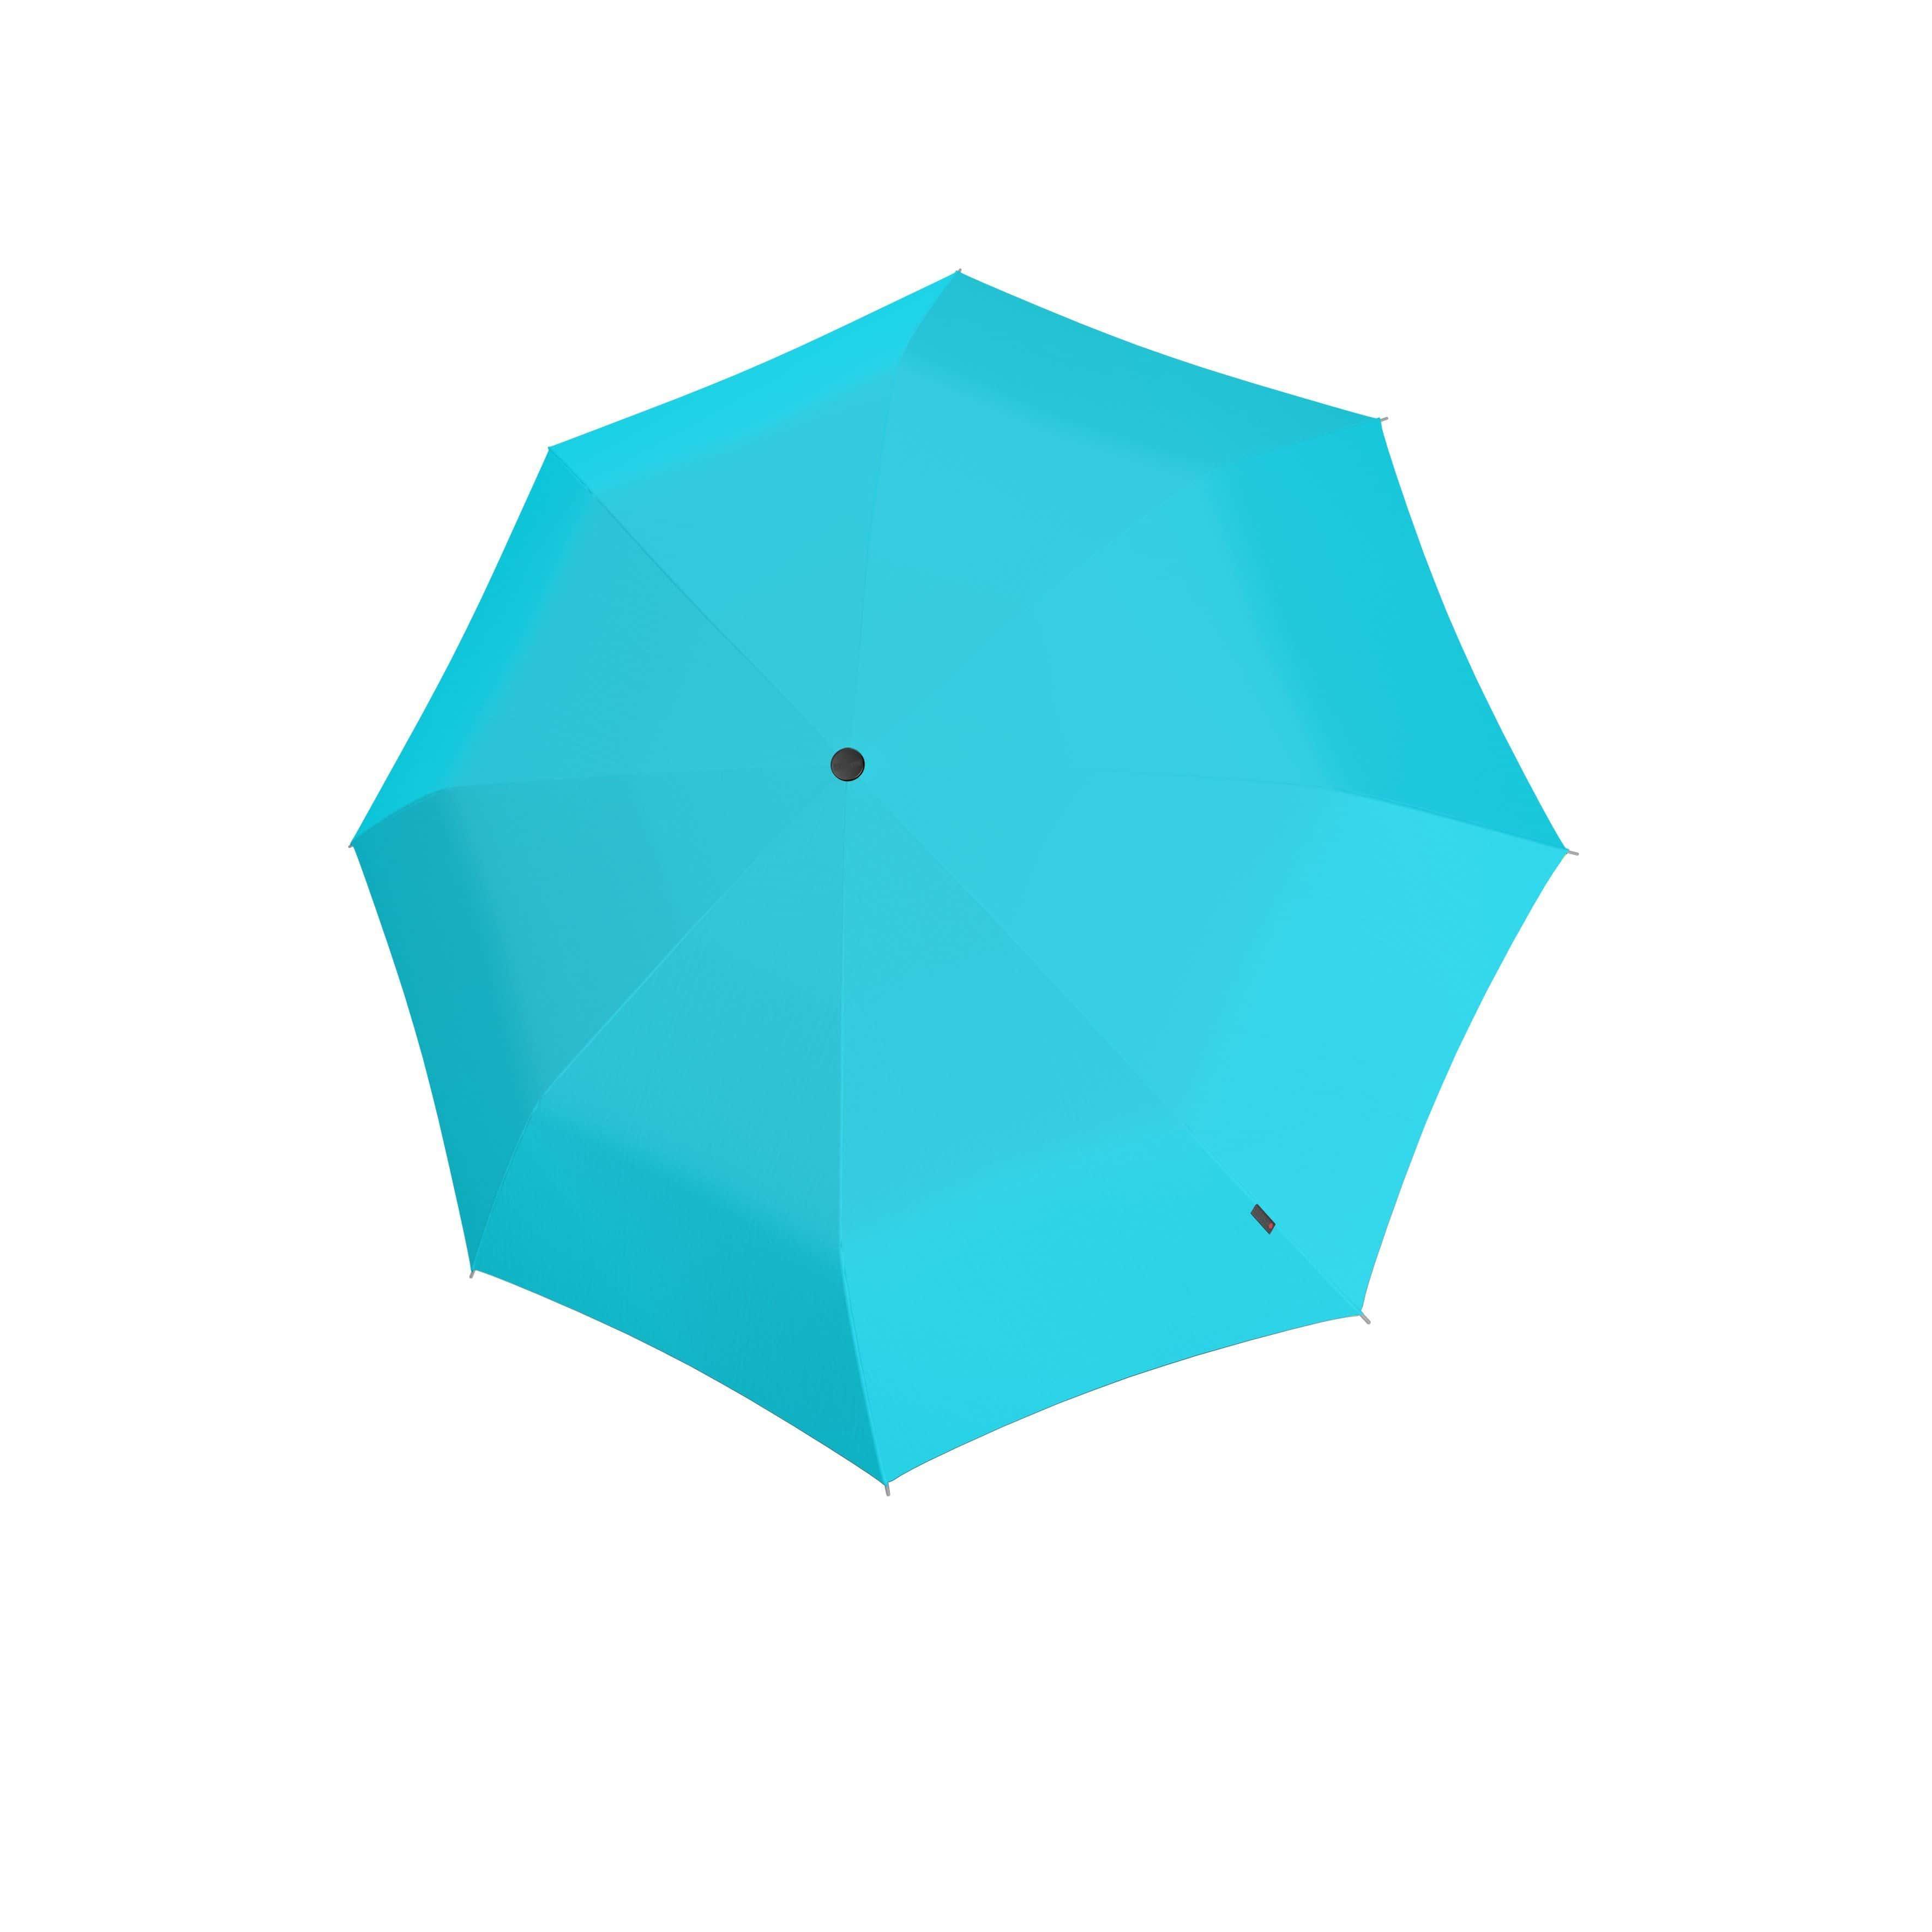 Knirps Umbrella U.090 Ultra Light XXL Manual Compact - foto 2